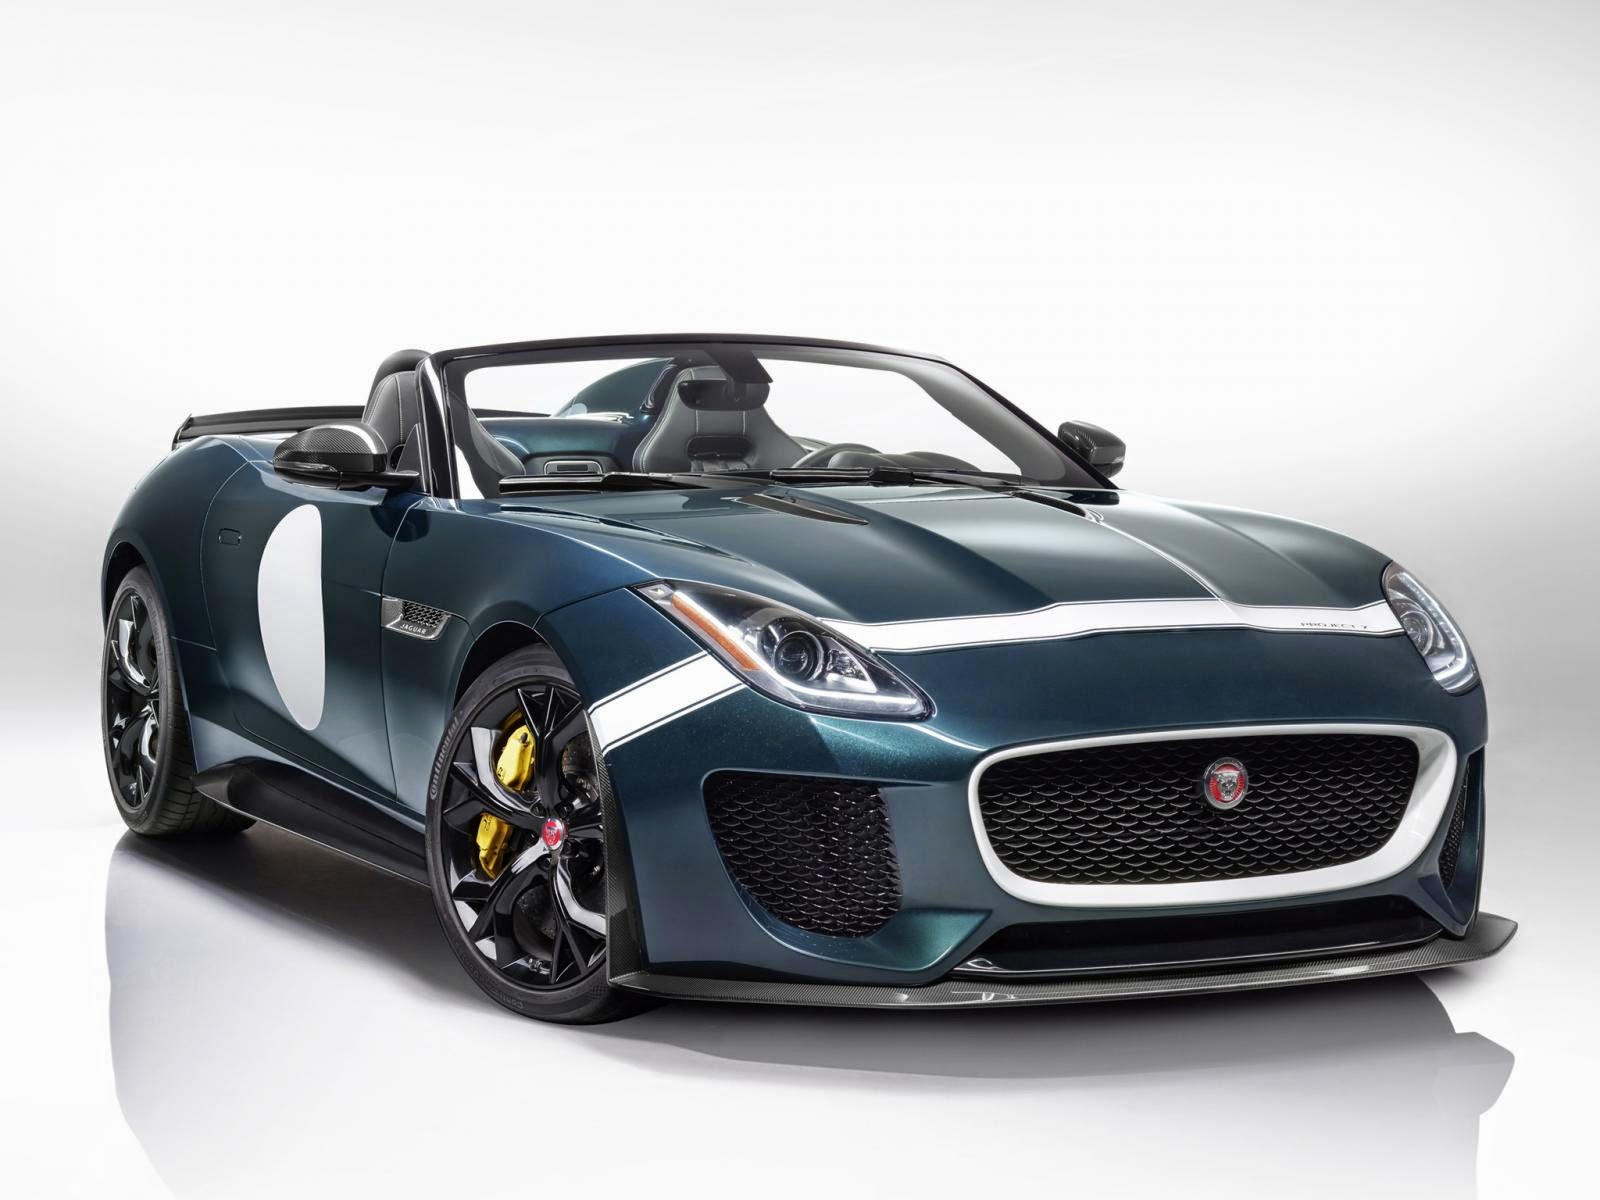 [Resim: Jaguar+Project+7+1.jpg]